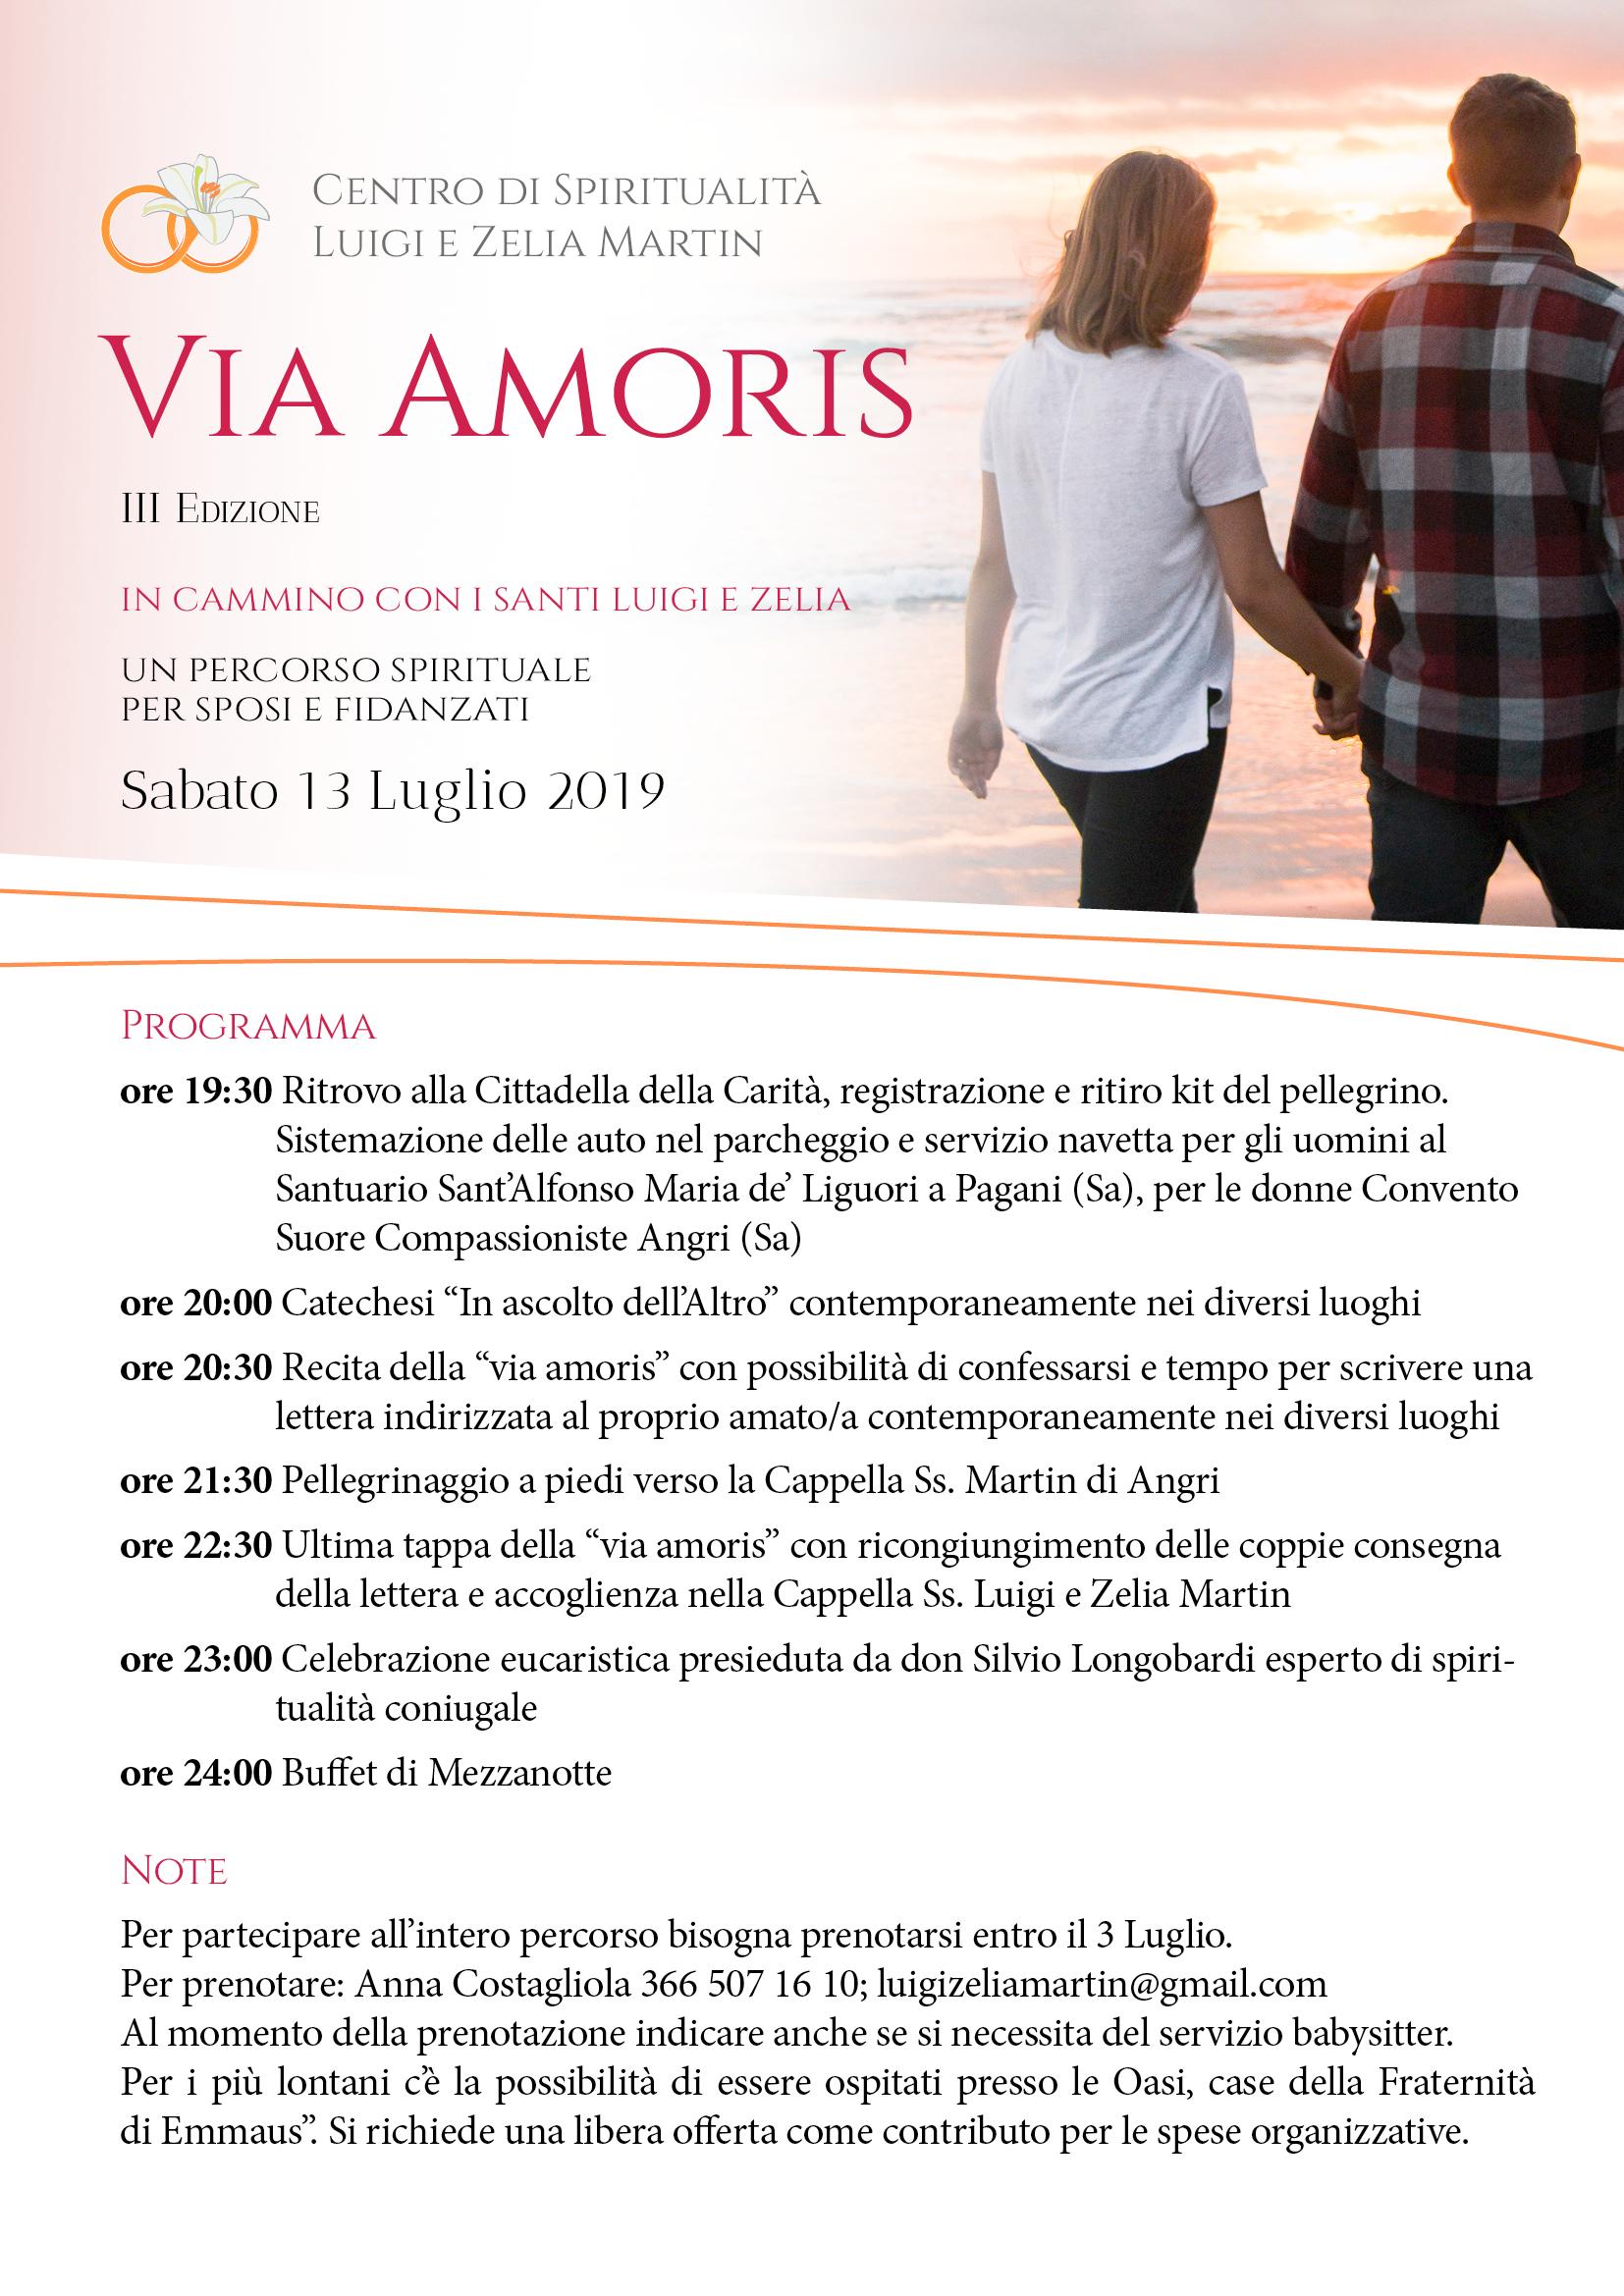 locandina VIA AMORIS 2019